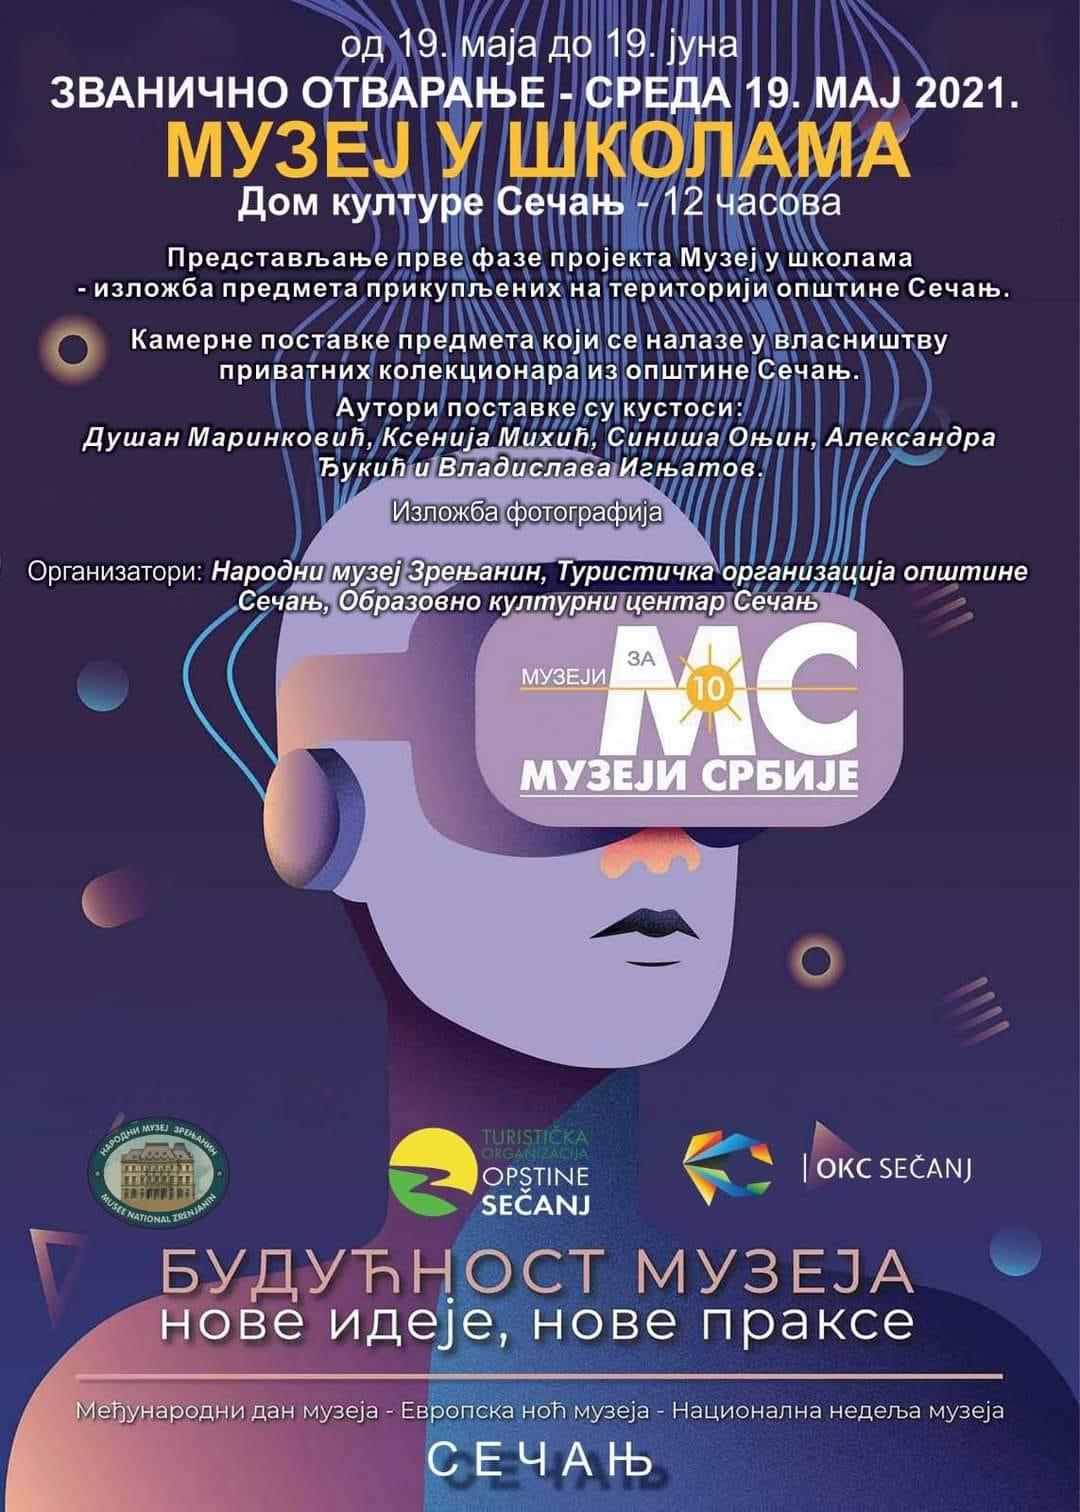 plakat-izlozba-muzej-u-skolama-2021-secanj